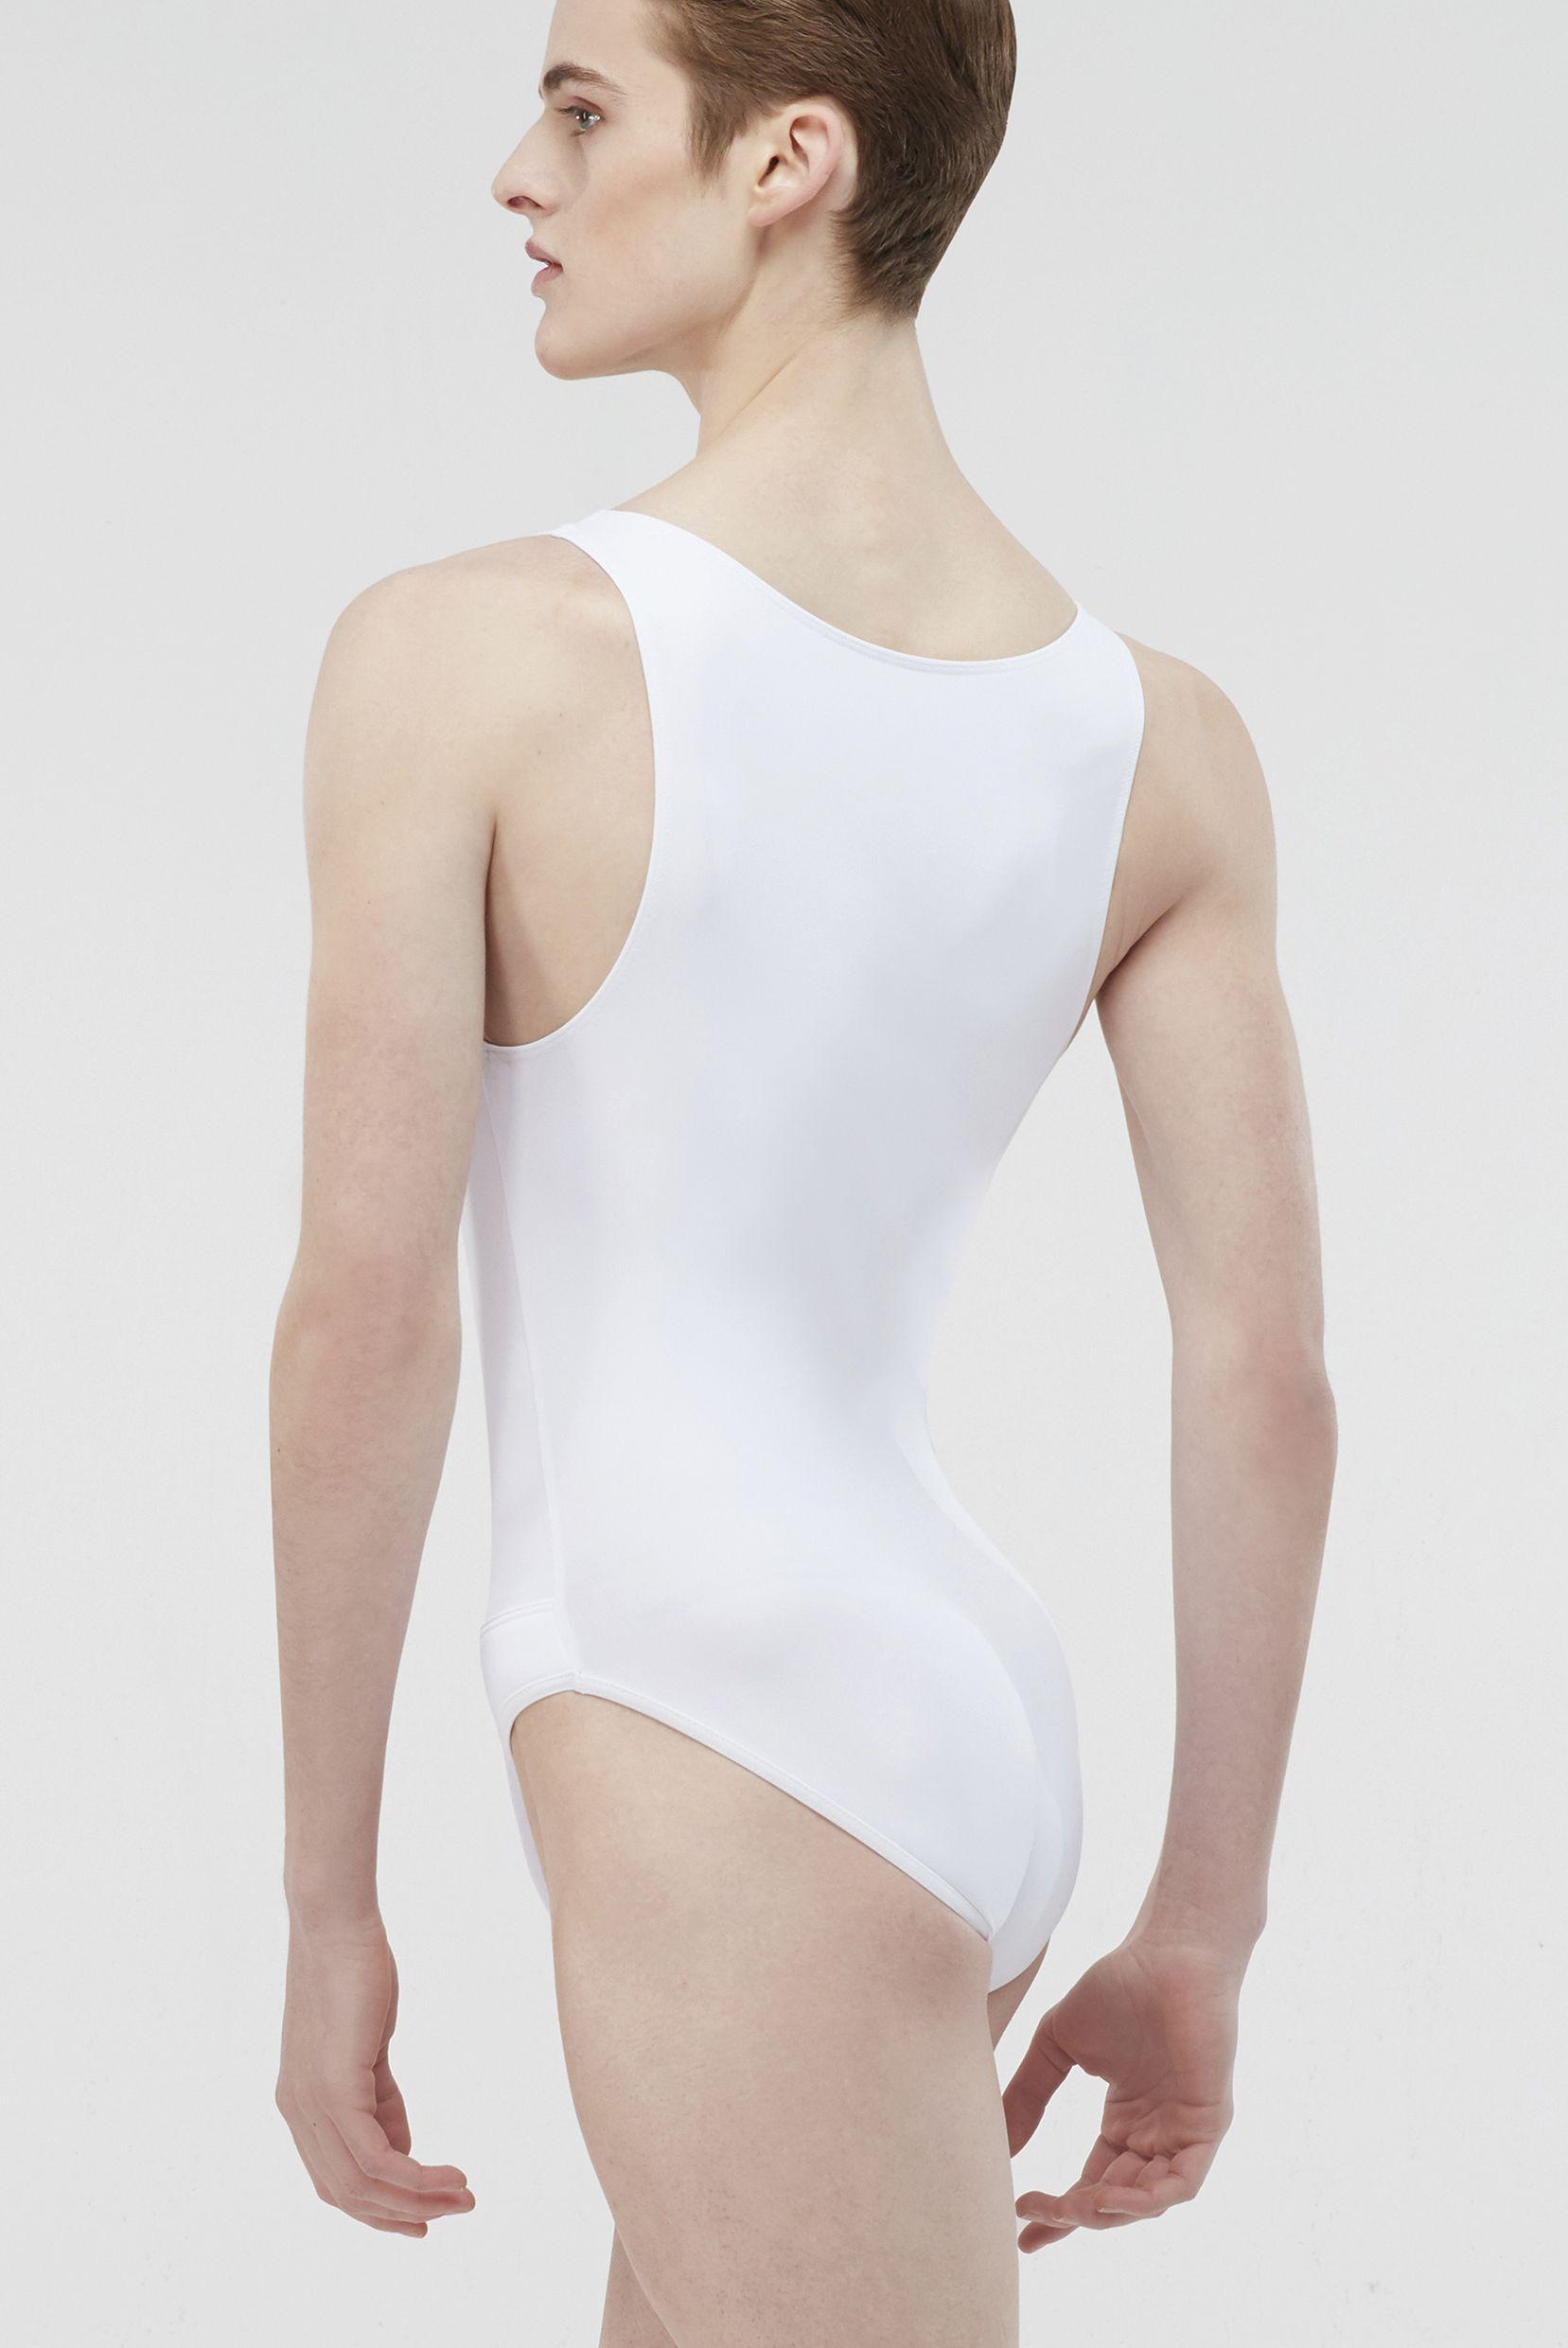 Octave Microfiber Basic Men S Full Tank Leotard With Attached Full Seat Dance Belt Wearmoi Ballet Ballet In 2020 Leotard Fashion Male Ballet Dancers Mens Leotard